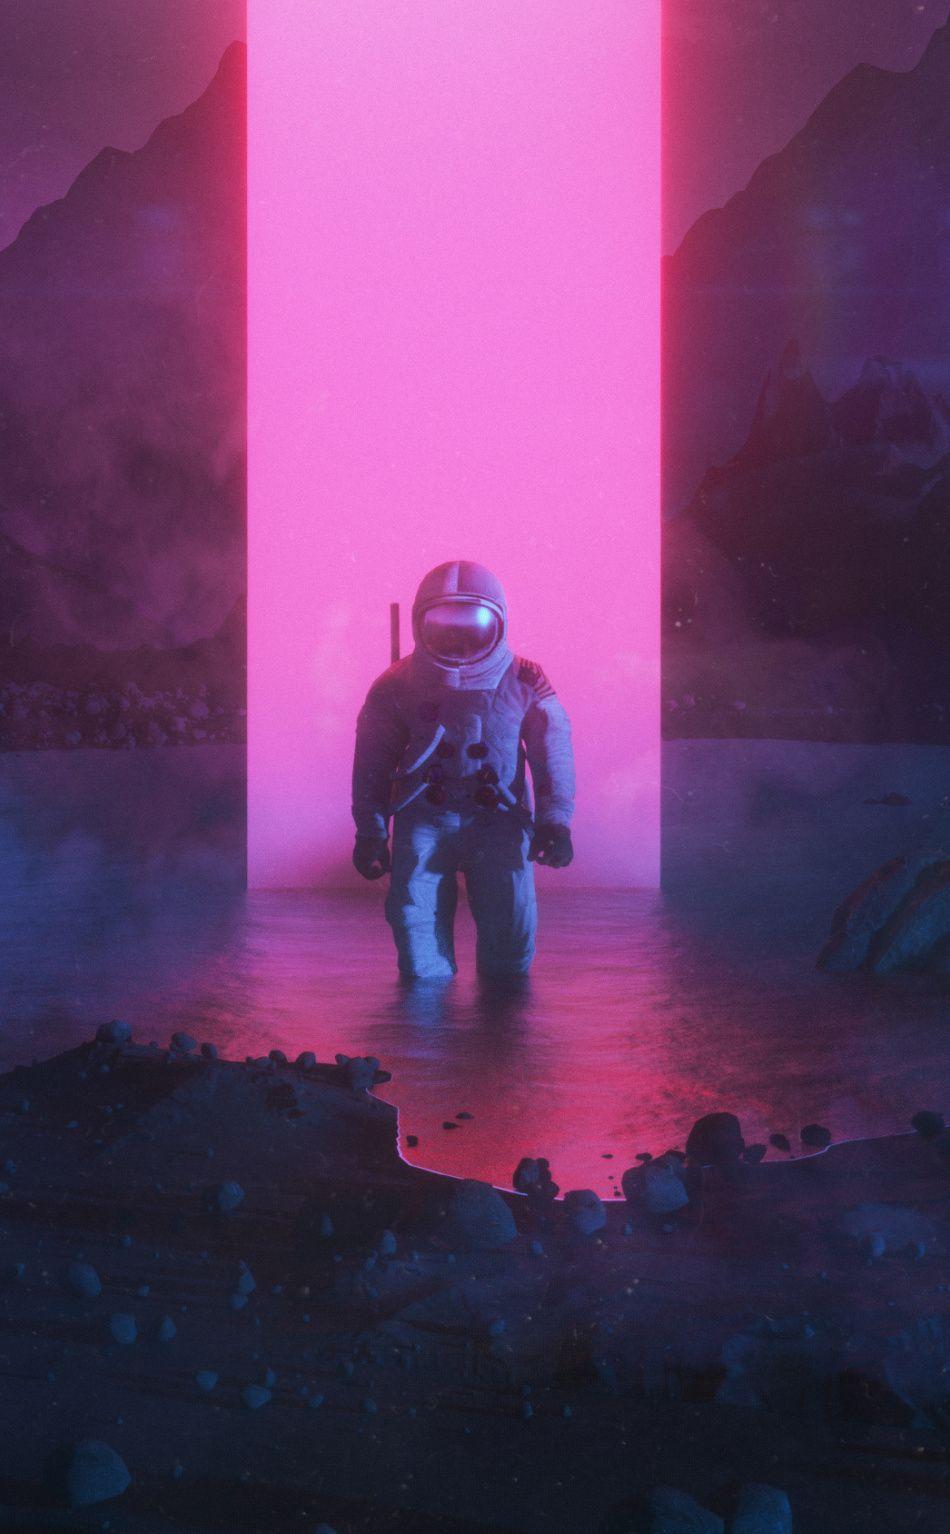 Artwork, astronaut, fantasy, 950x1534 wallpaper